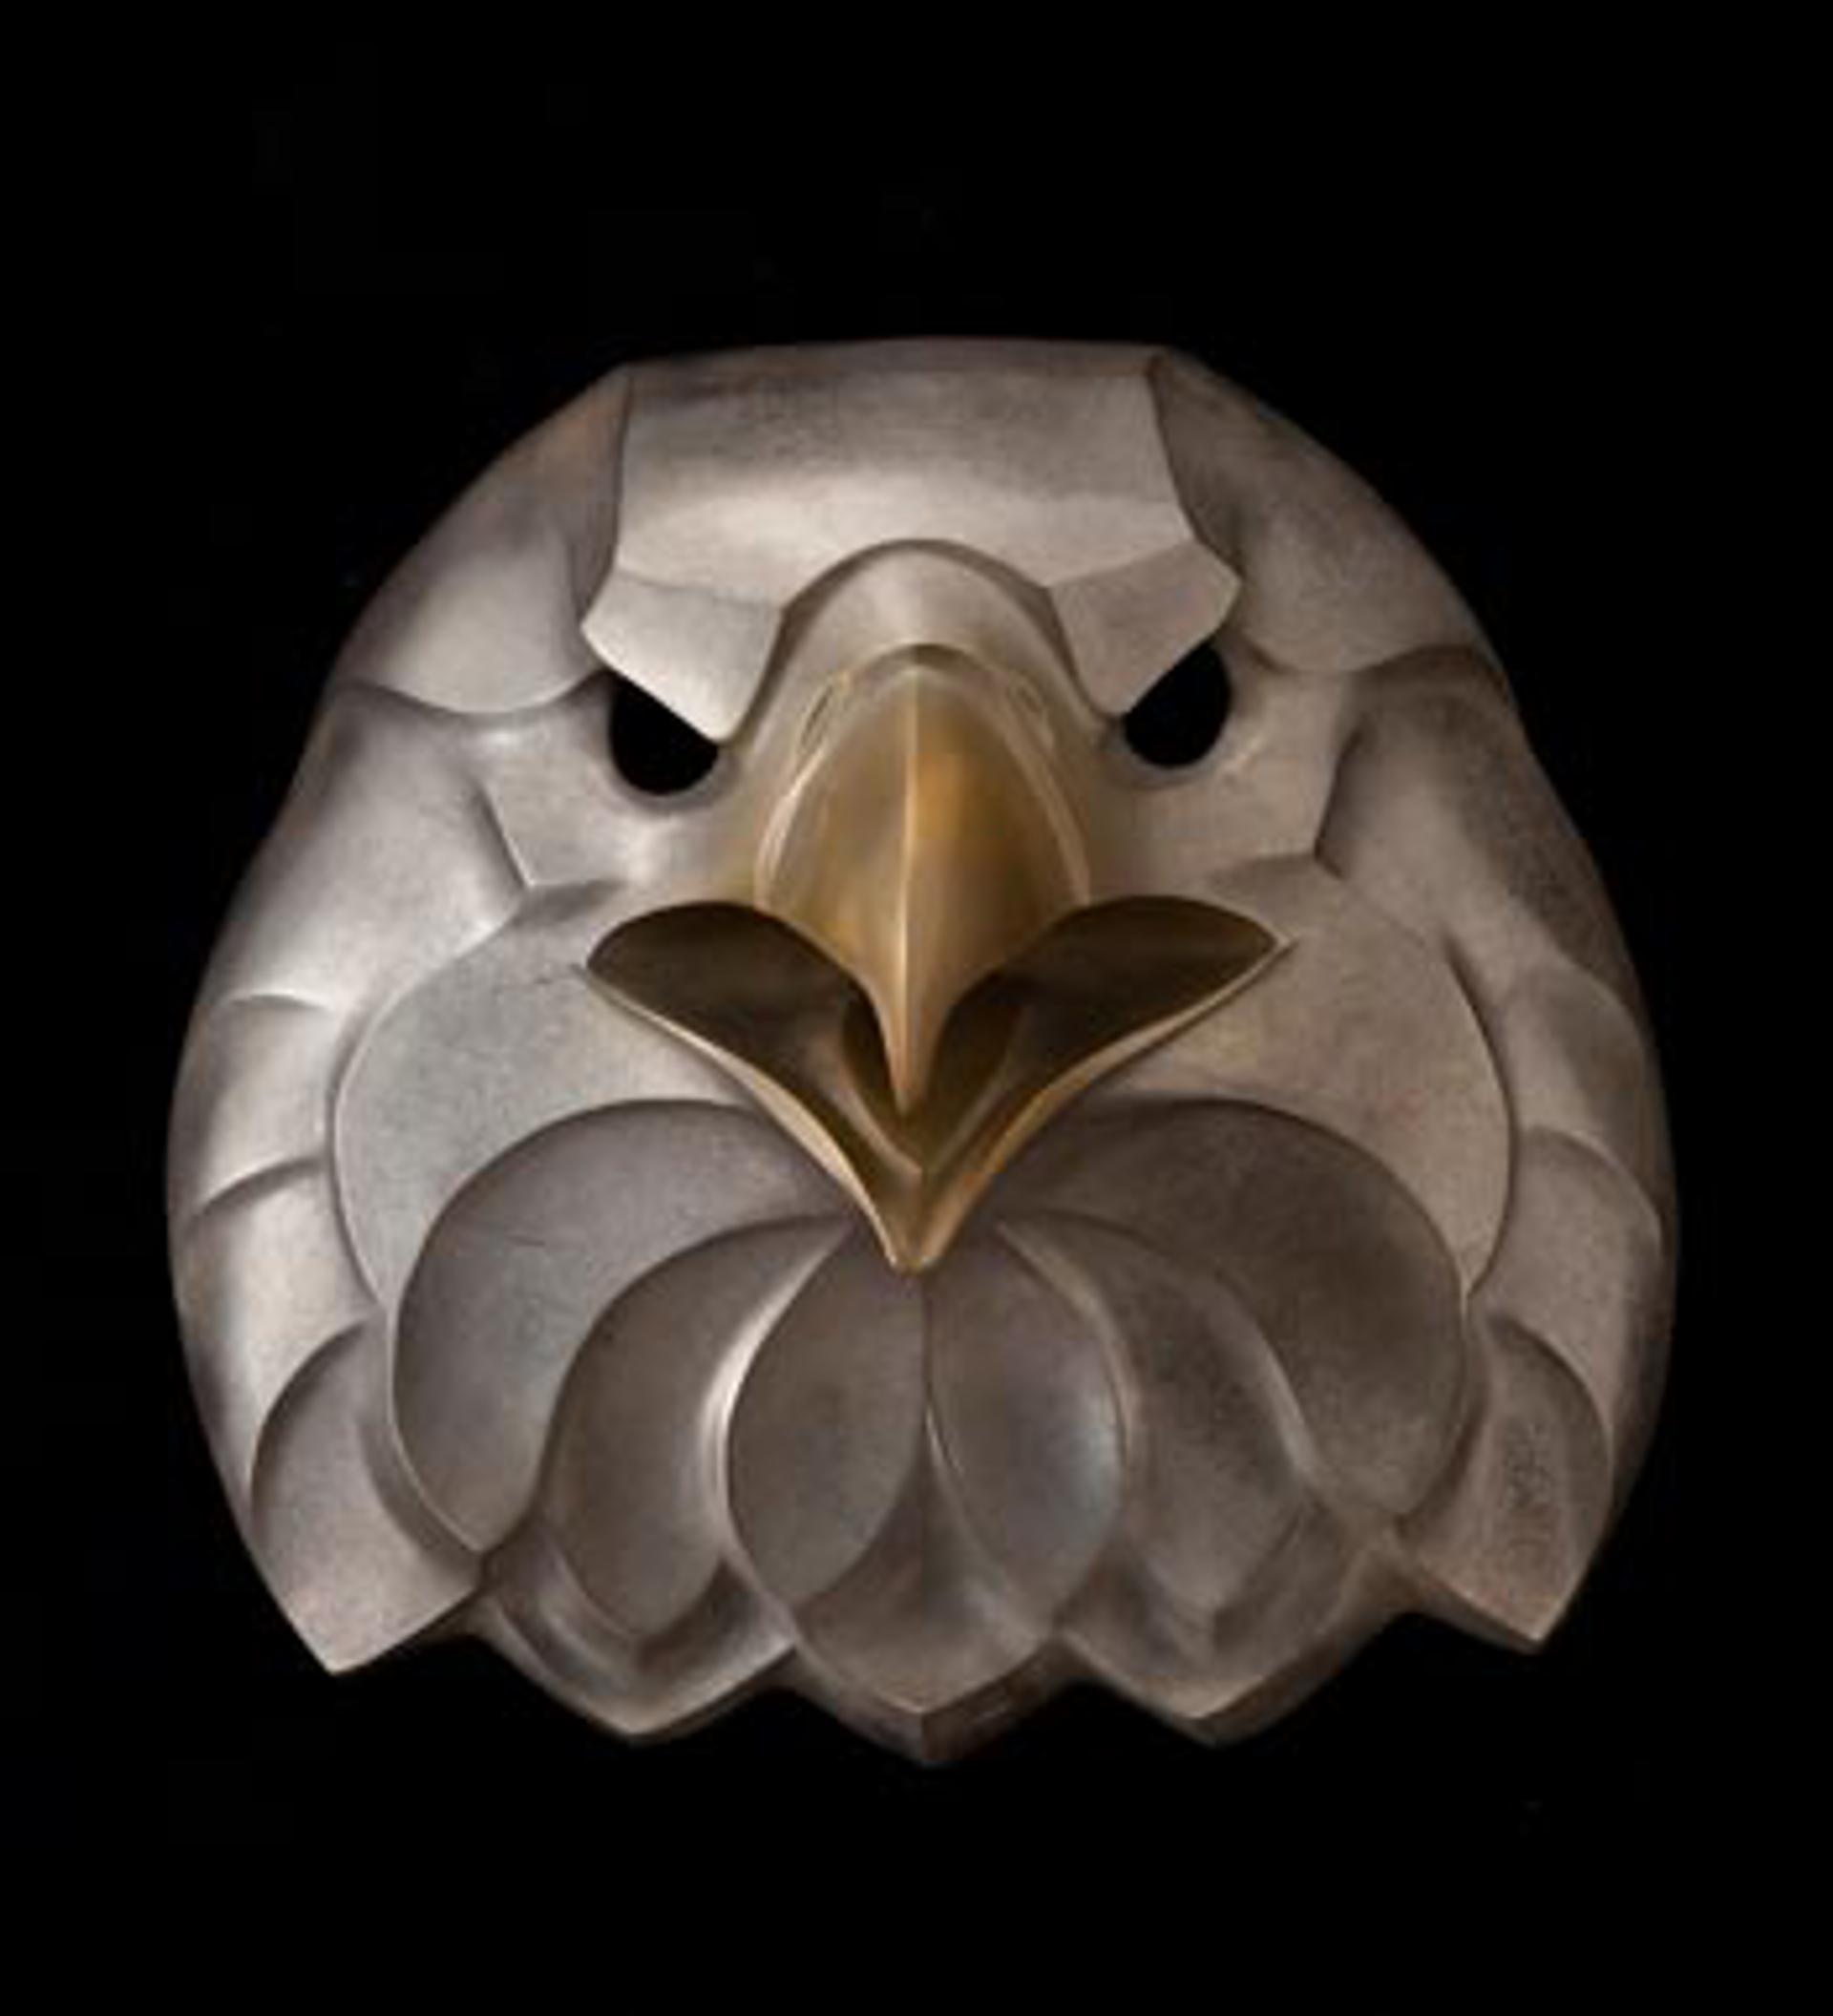 Eagle Mask by Rosetta